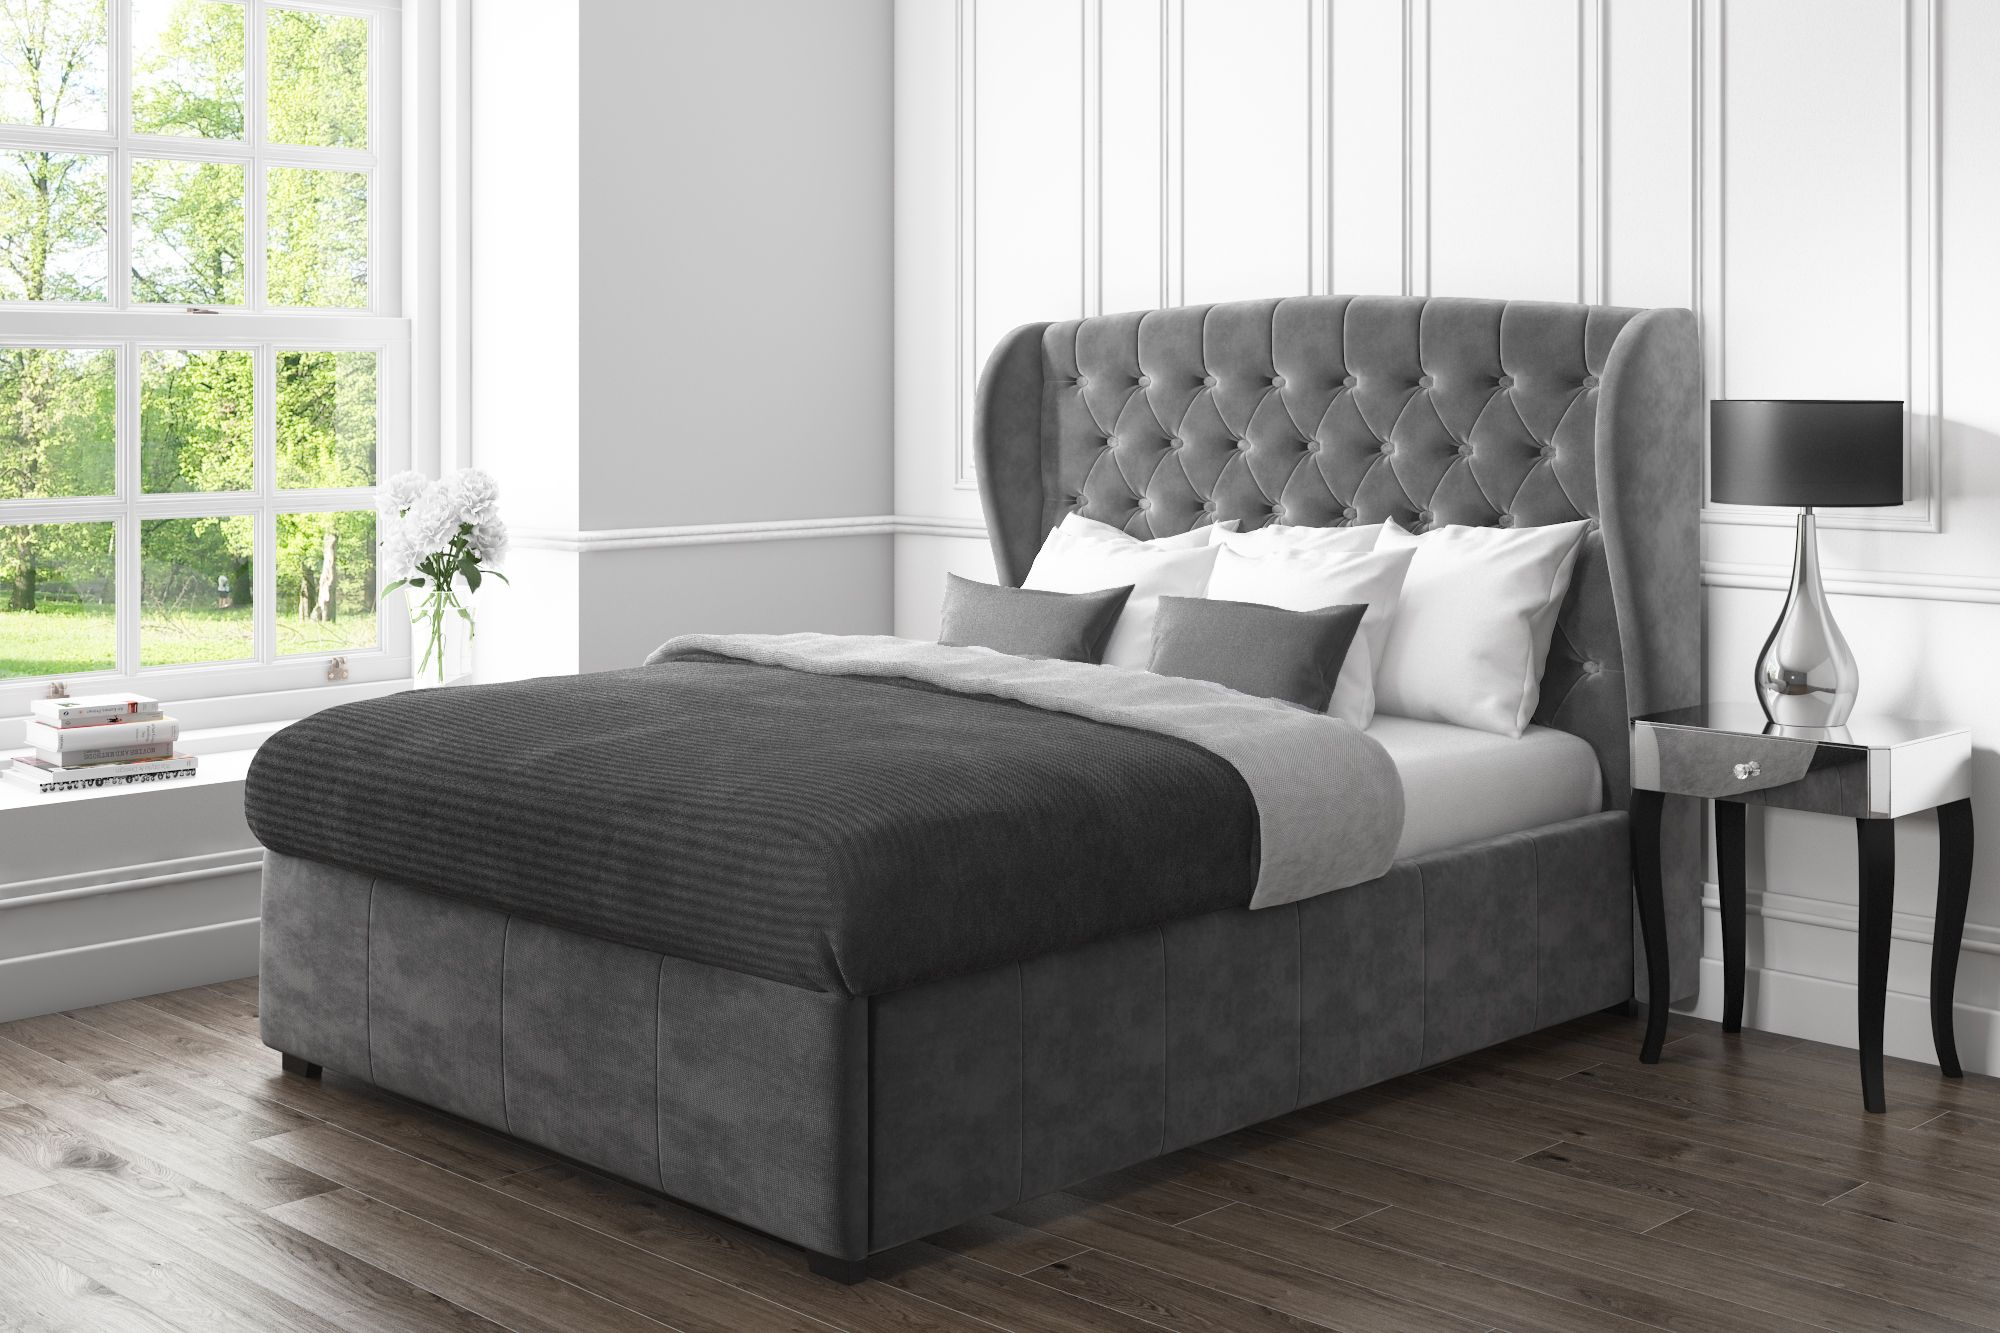 Surprising Safina Wing Back Double Ottoman Bed In Grey Velvet Saf021 Spiritservingveterans Wood Chair Design Ideas Spiritservingveteransorg